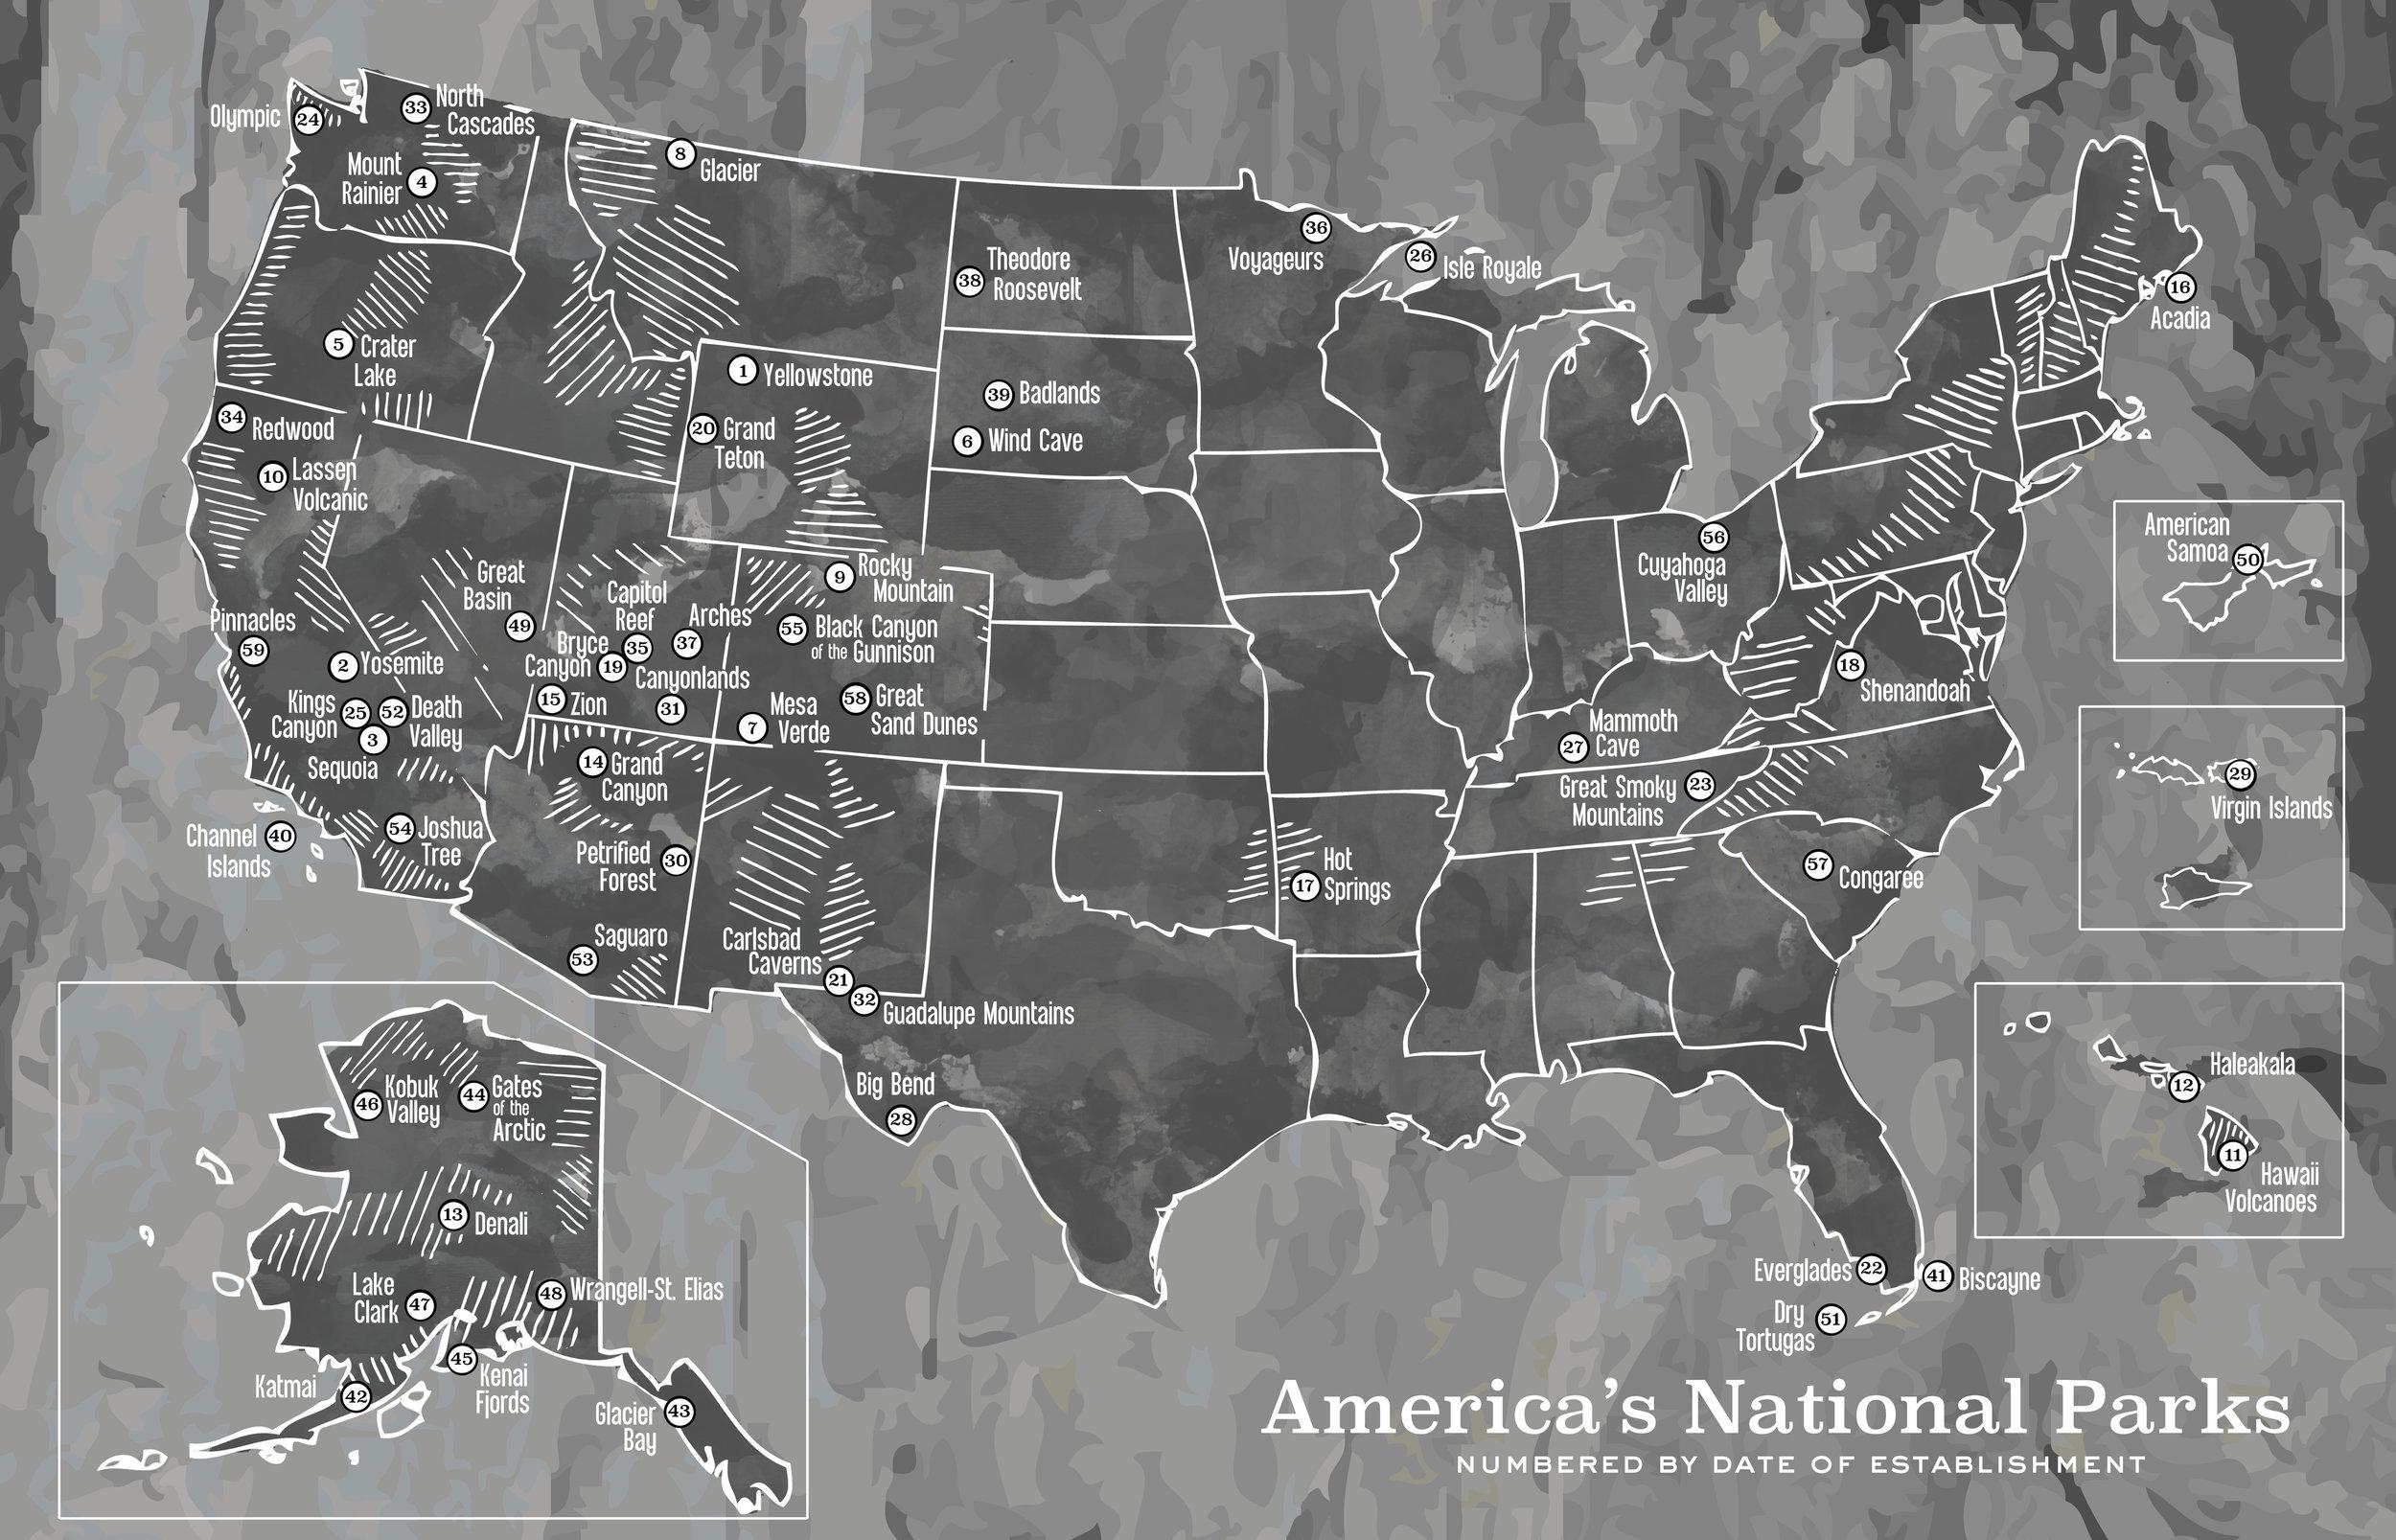 United States National Parks, 2015